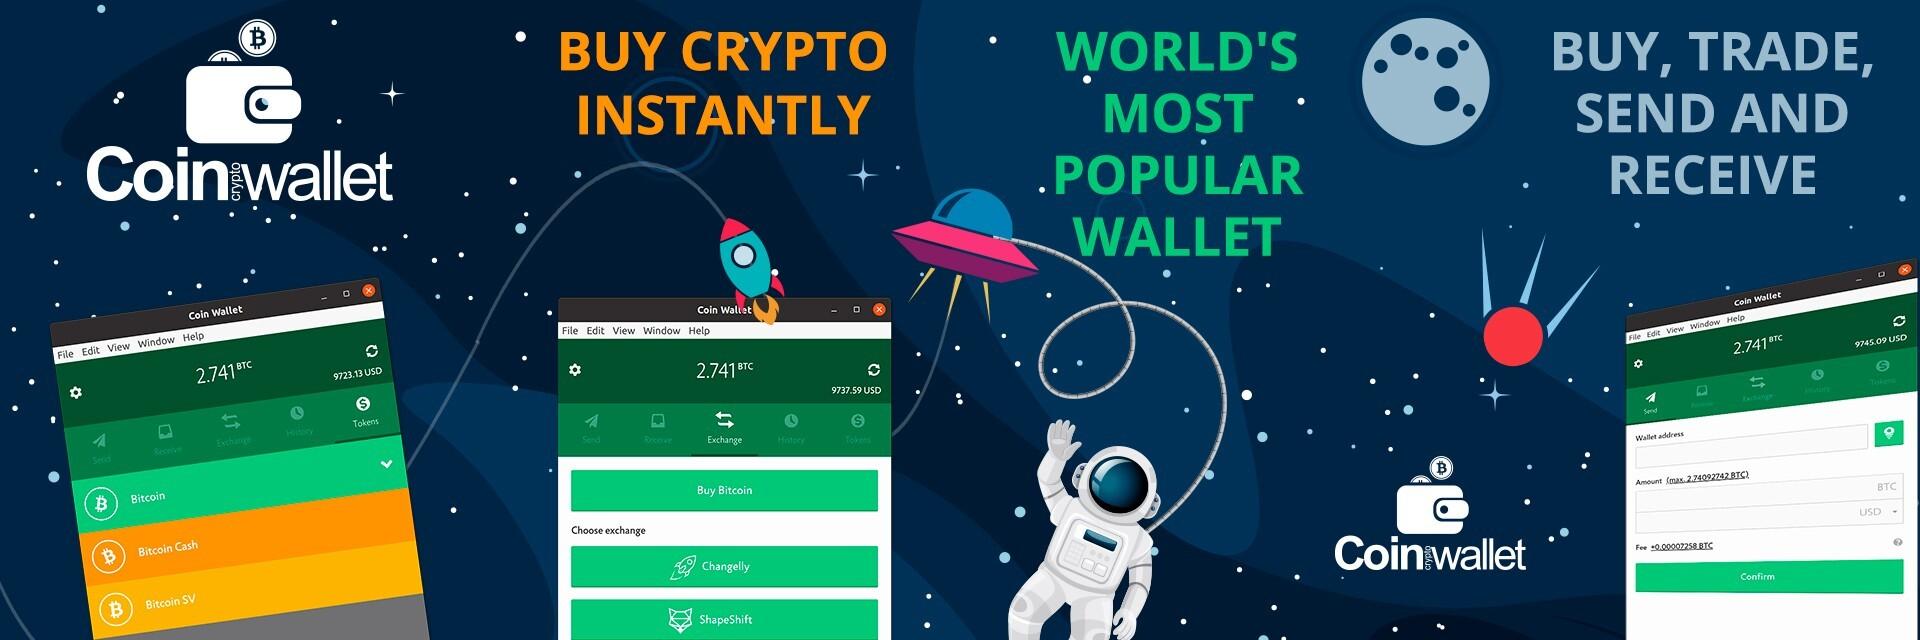 Coin Wallet banner